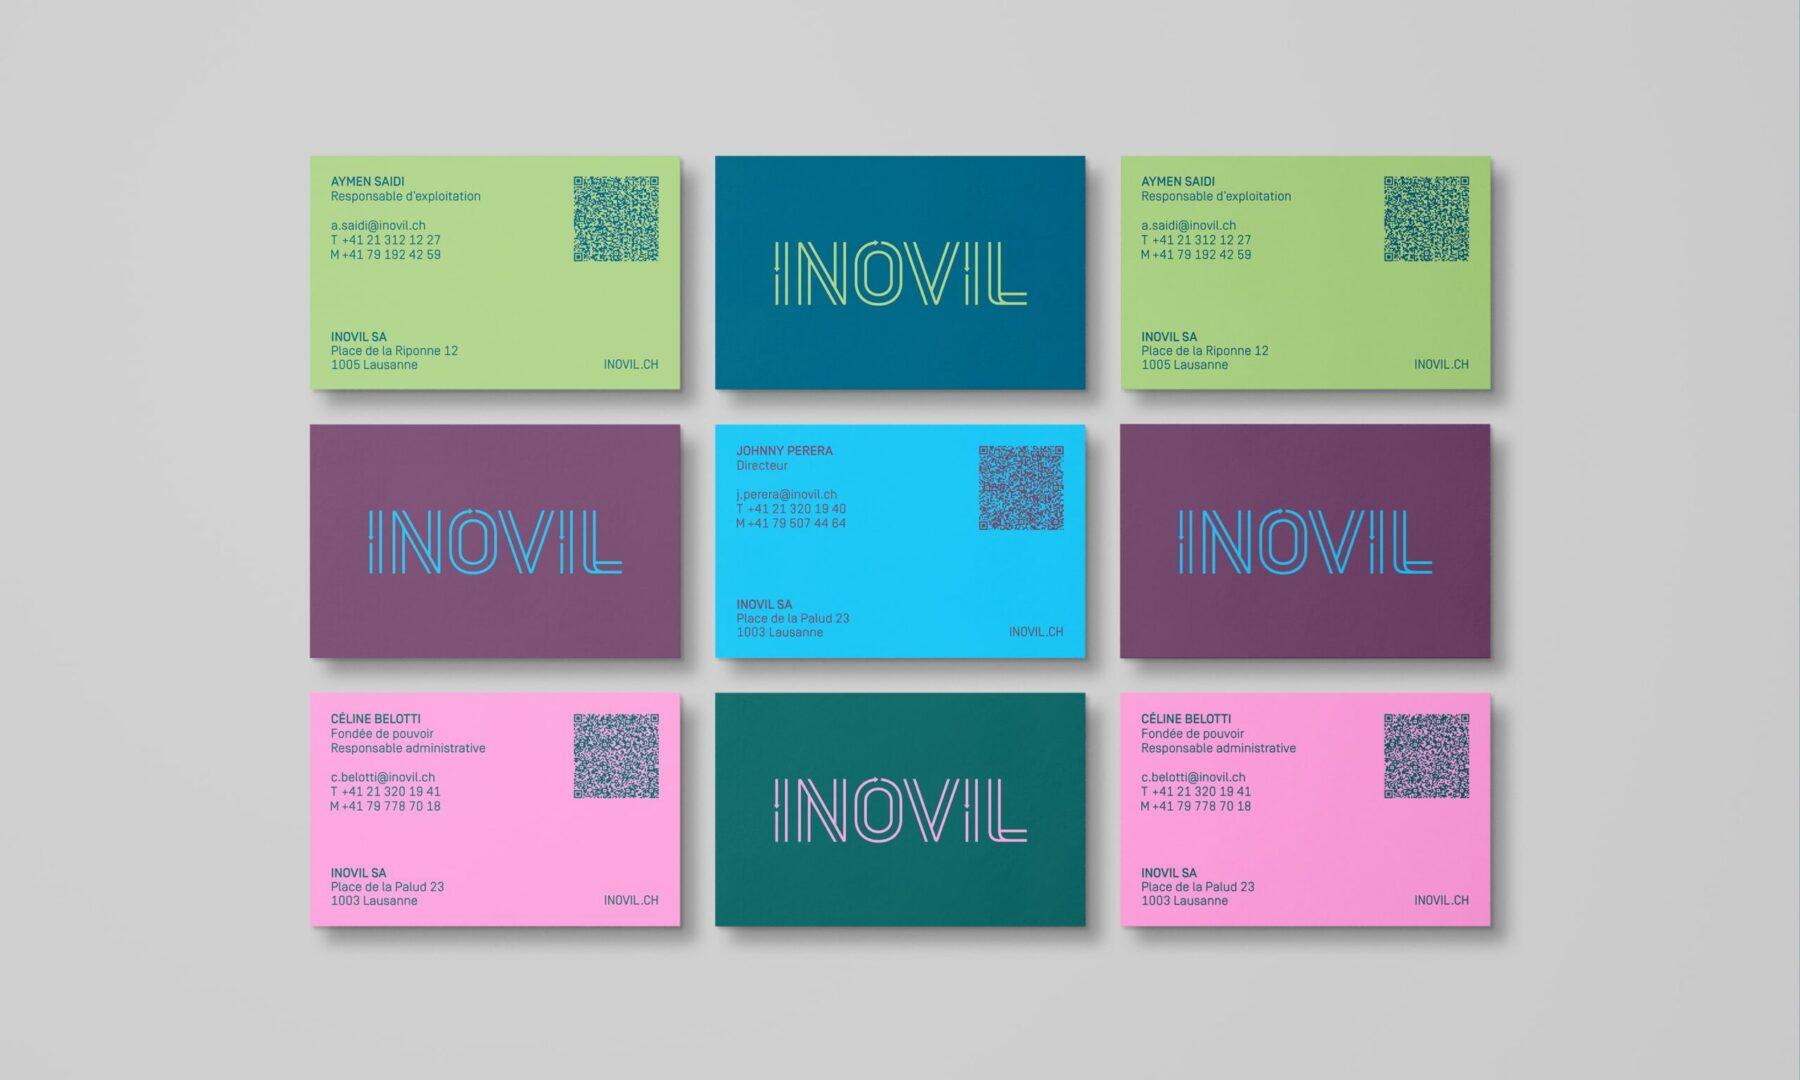 INOVIL_Portfolio_V2_1